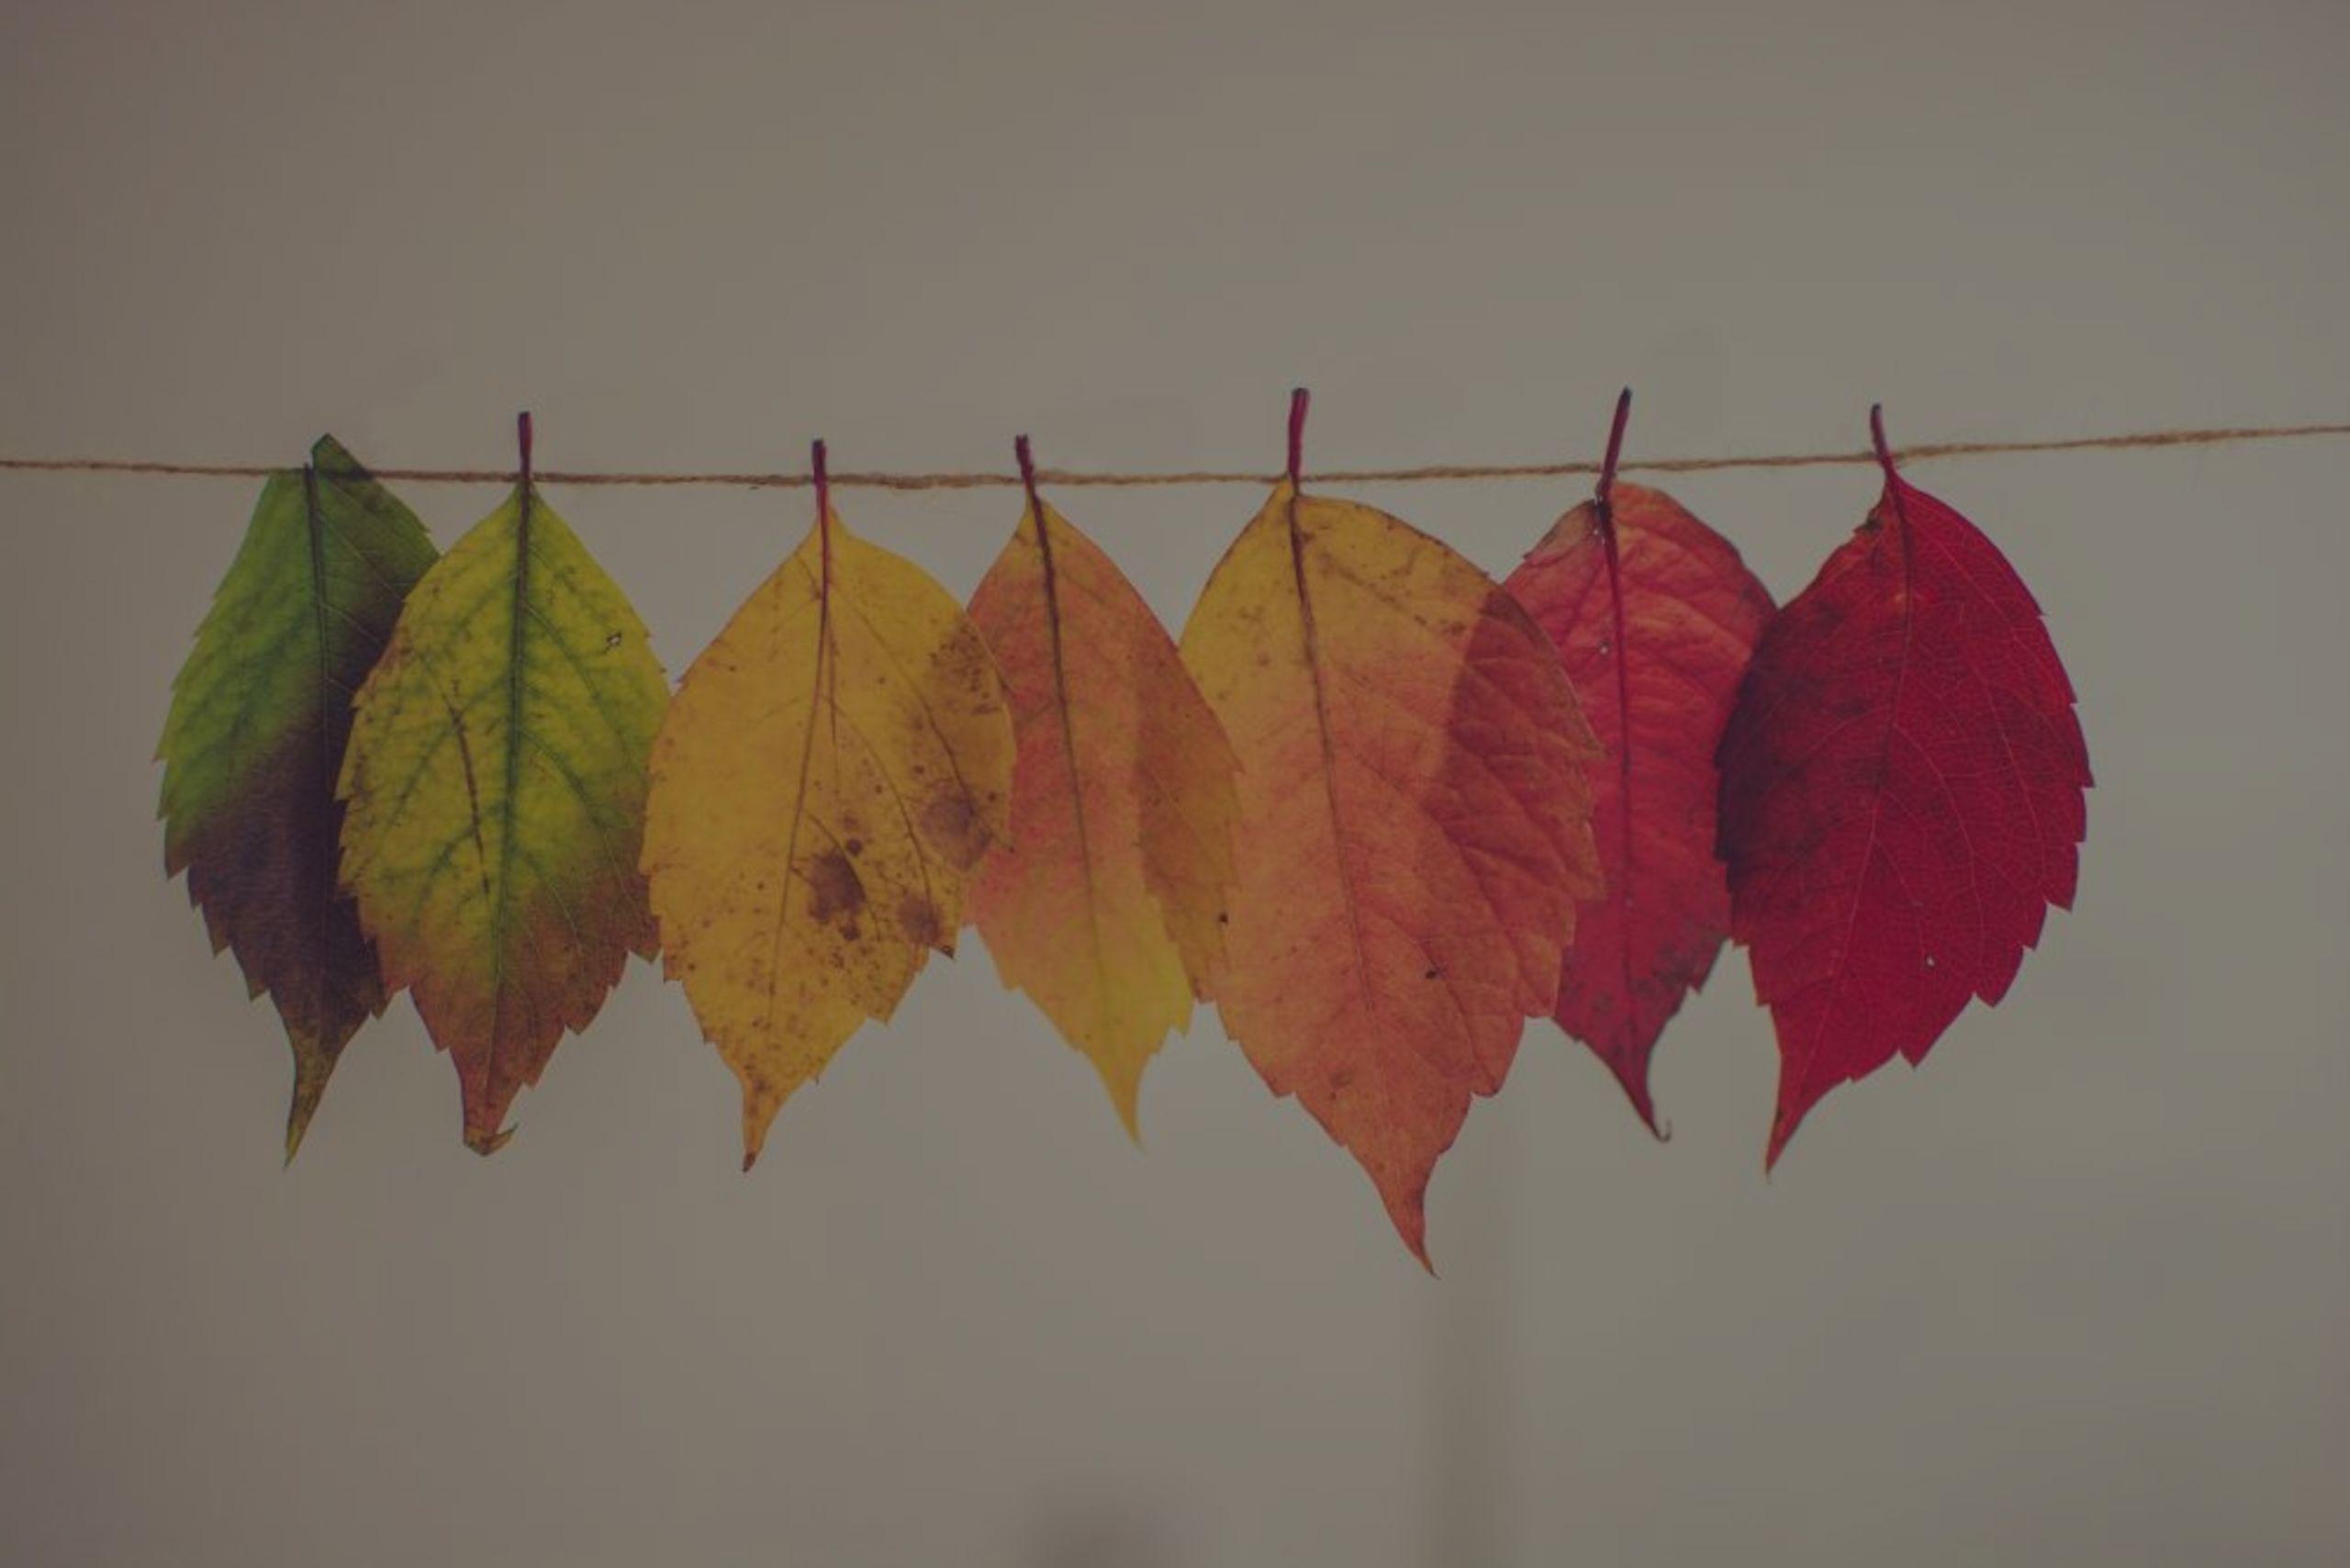 Fall Updates in La Verne, Rancho Cucamonga, Glendora, Azusa and more!